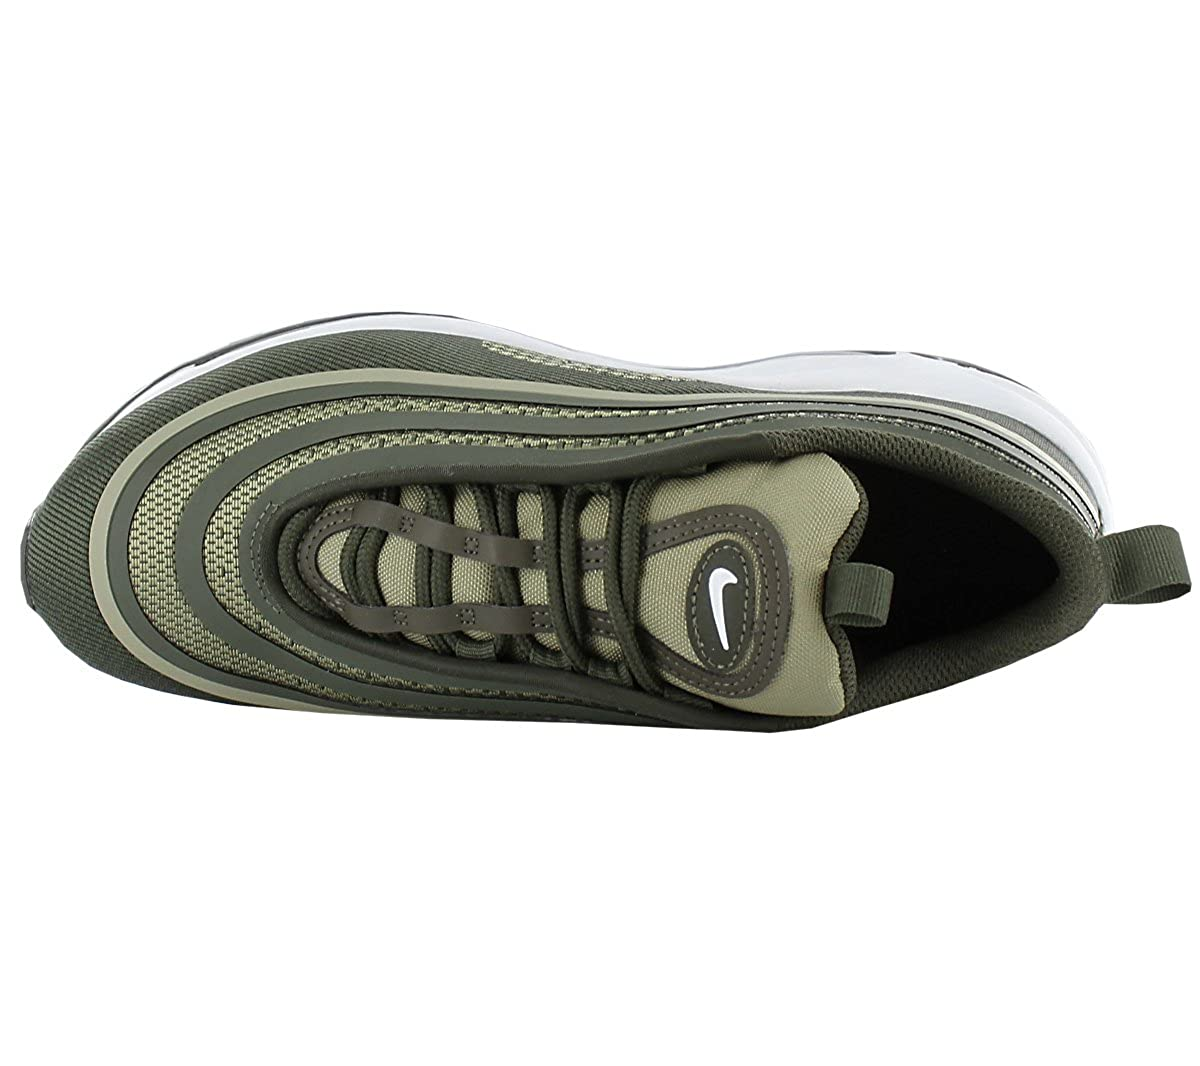 Nike - Basket Air Max 97 UL 17 GS 917998-300 Kaki - Couleur Vert - Taille  36.5  Amazon.fr  Chaussures et Sacs 8e7a5846eb4d